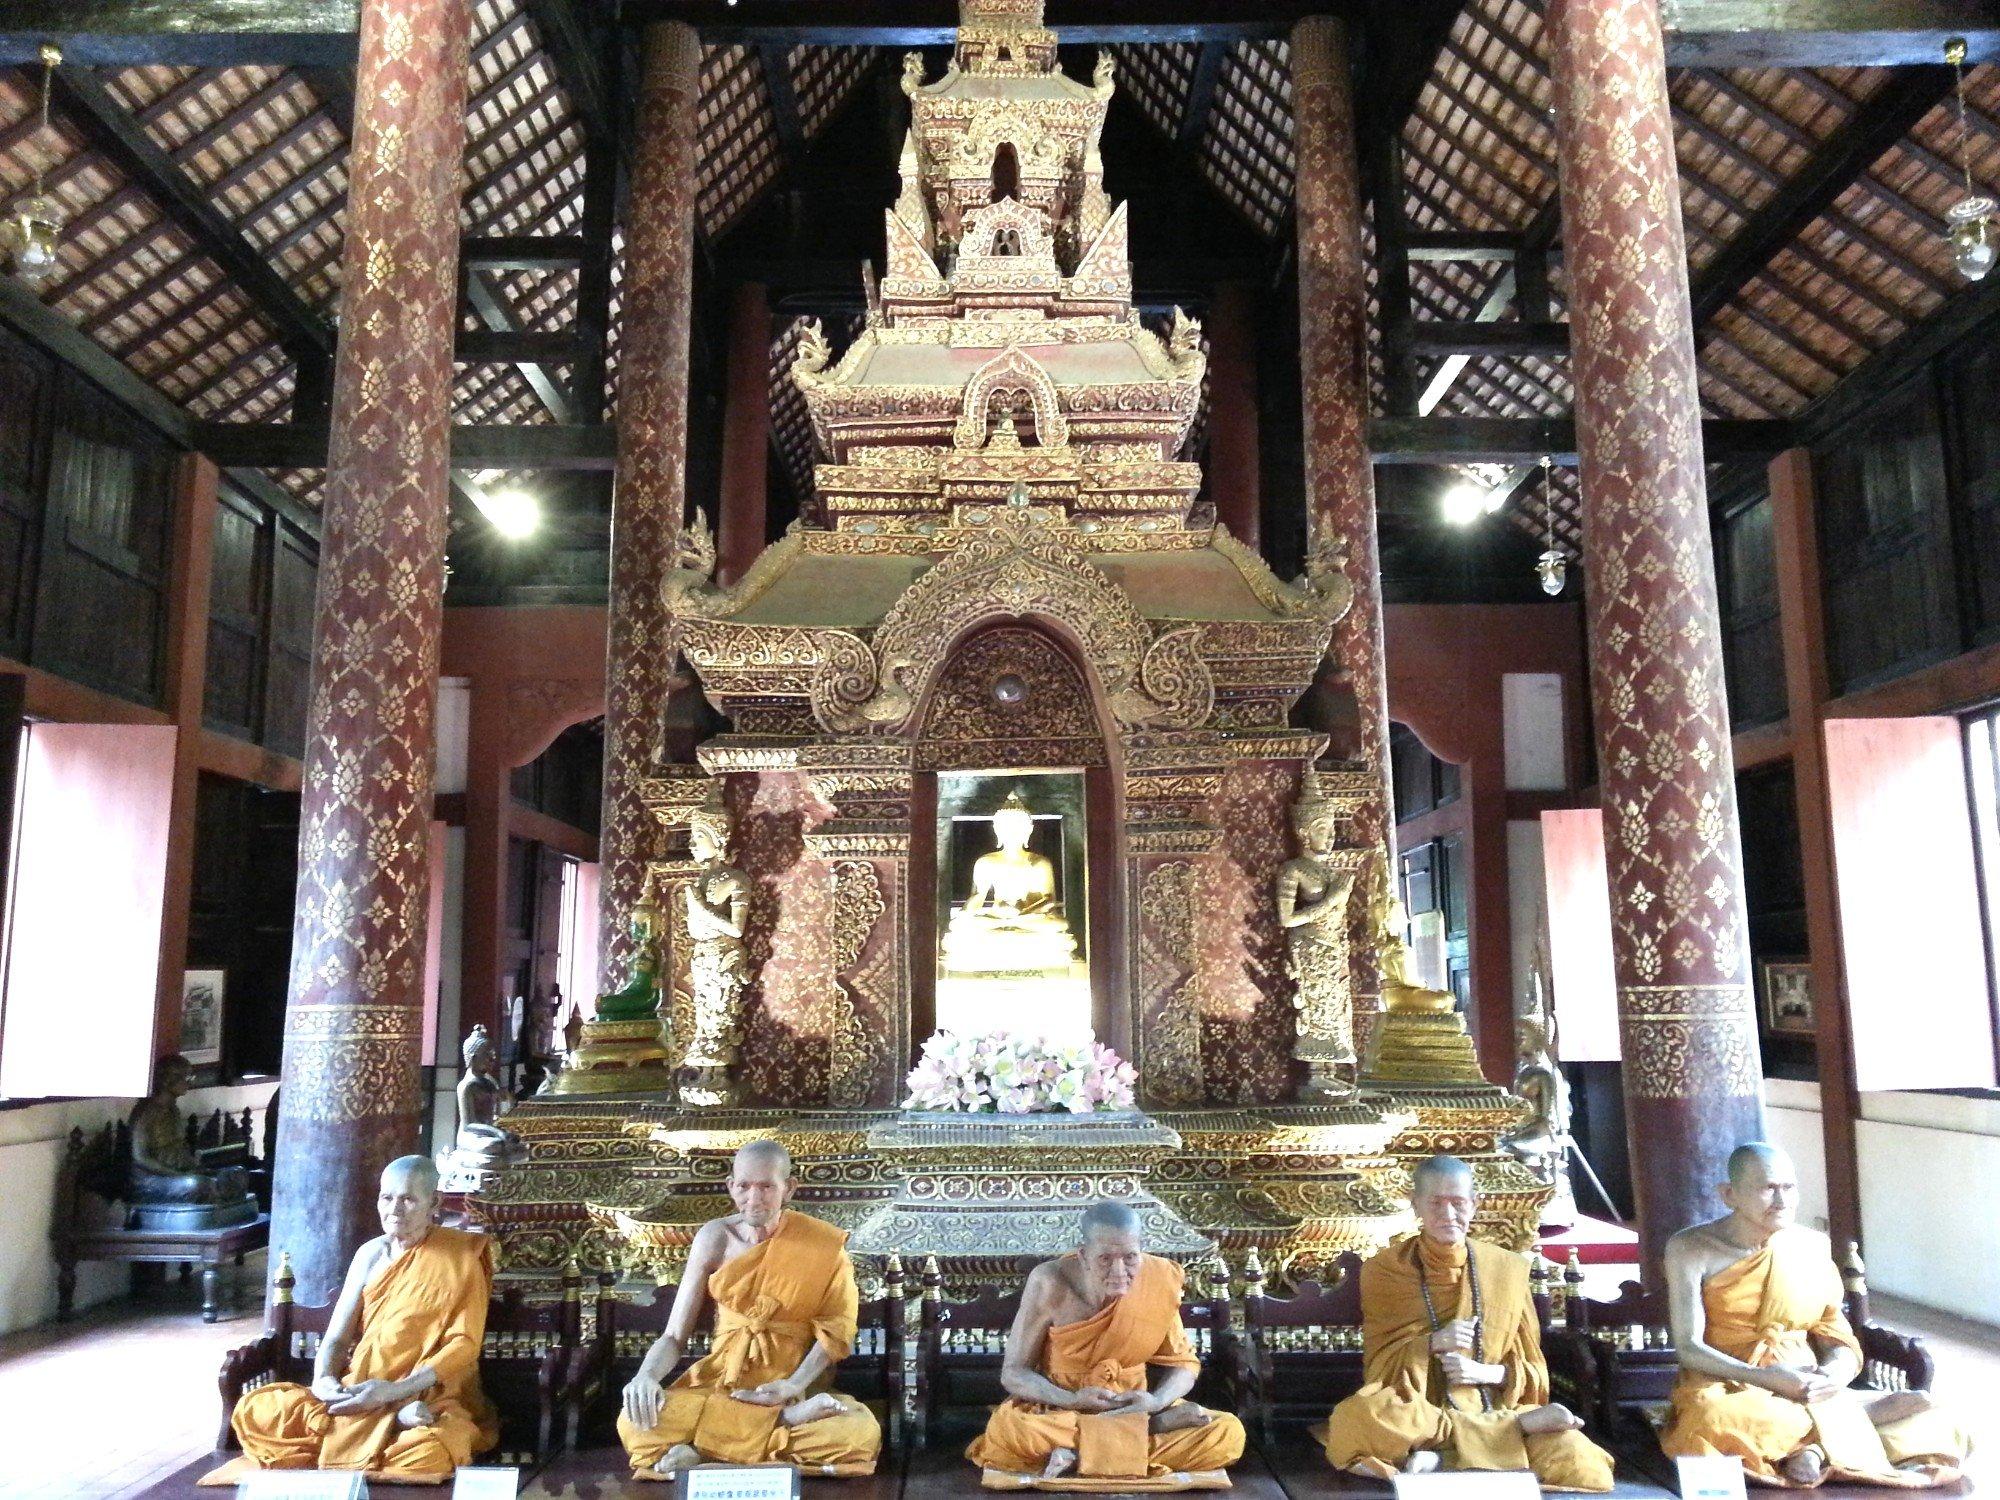 Inside Viharn Luang at Wat Phra Singh